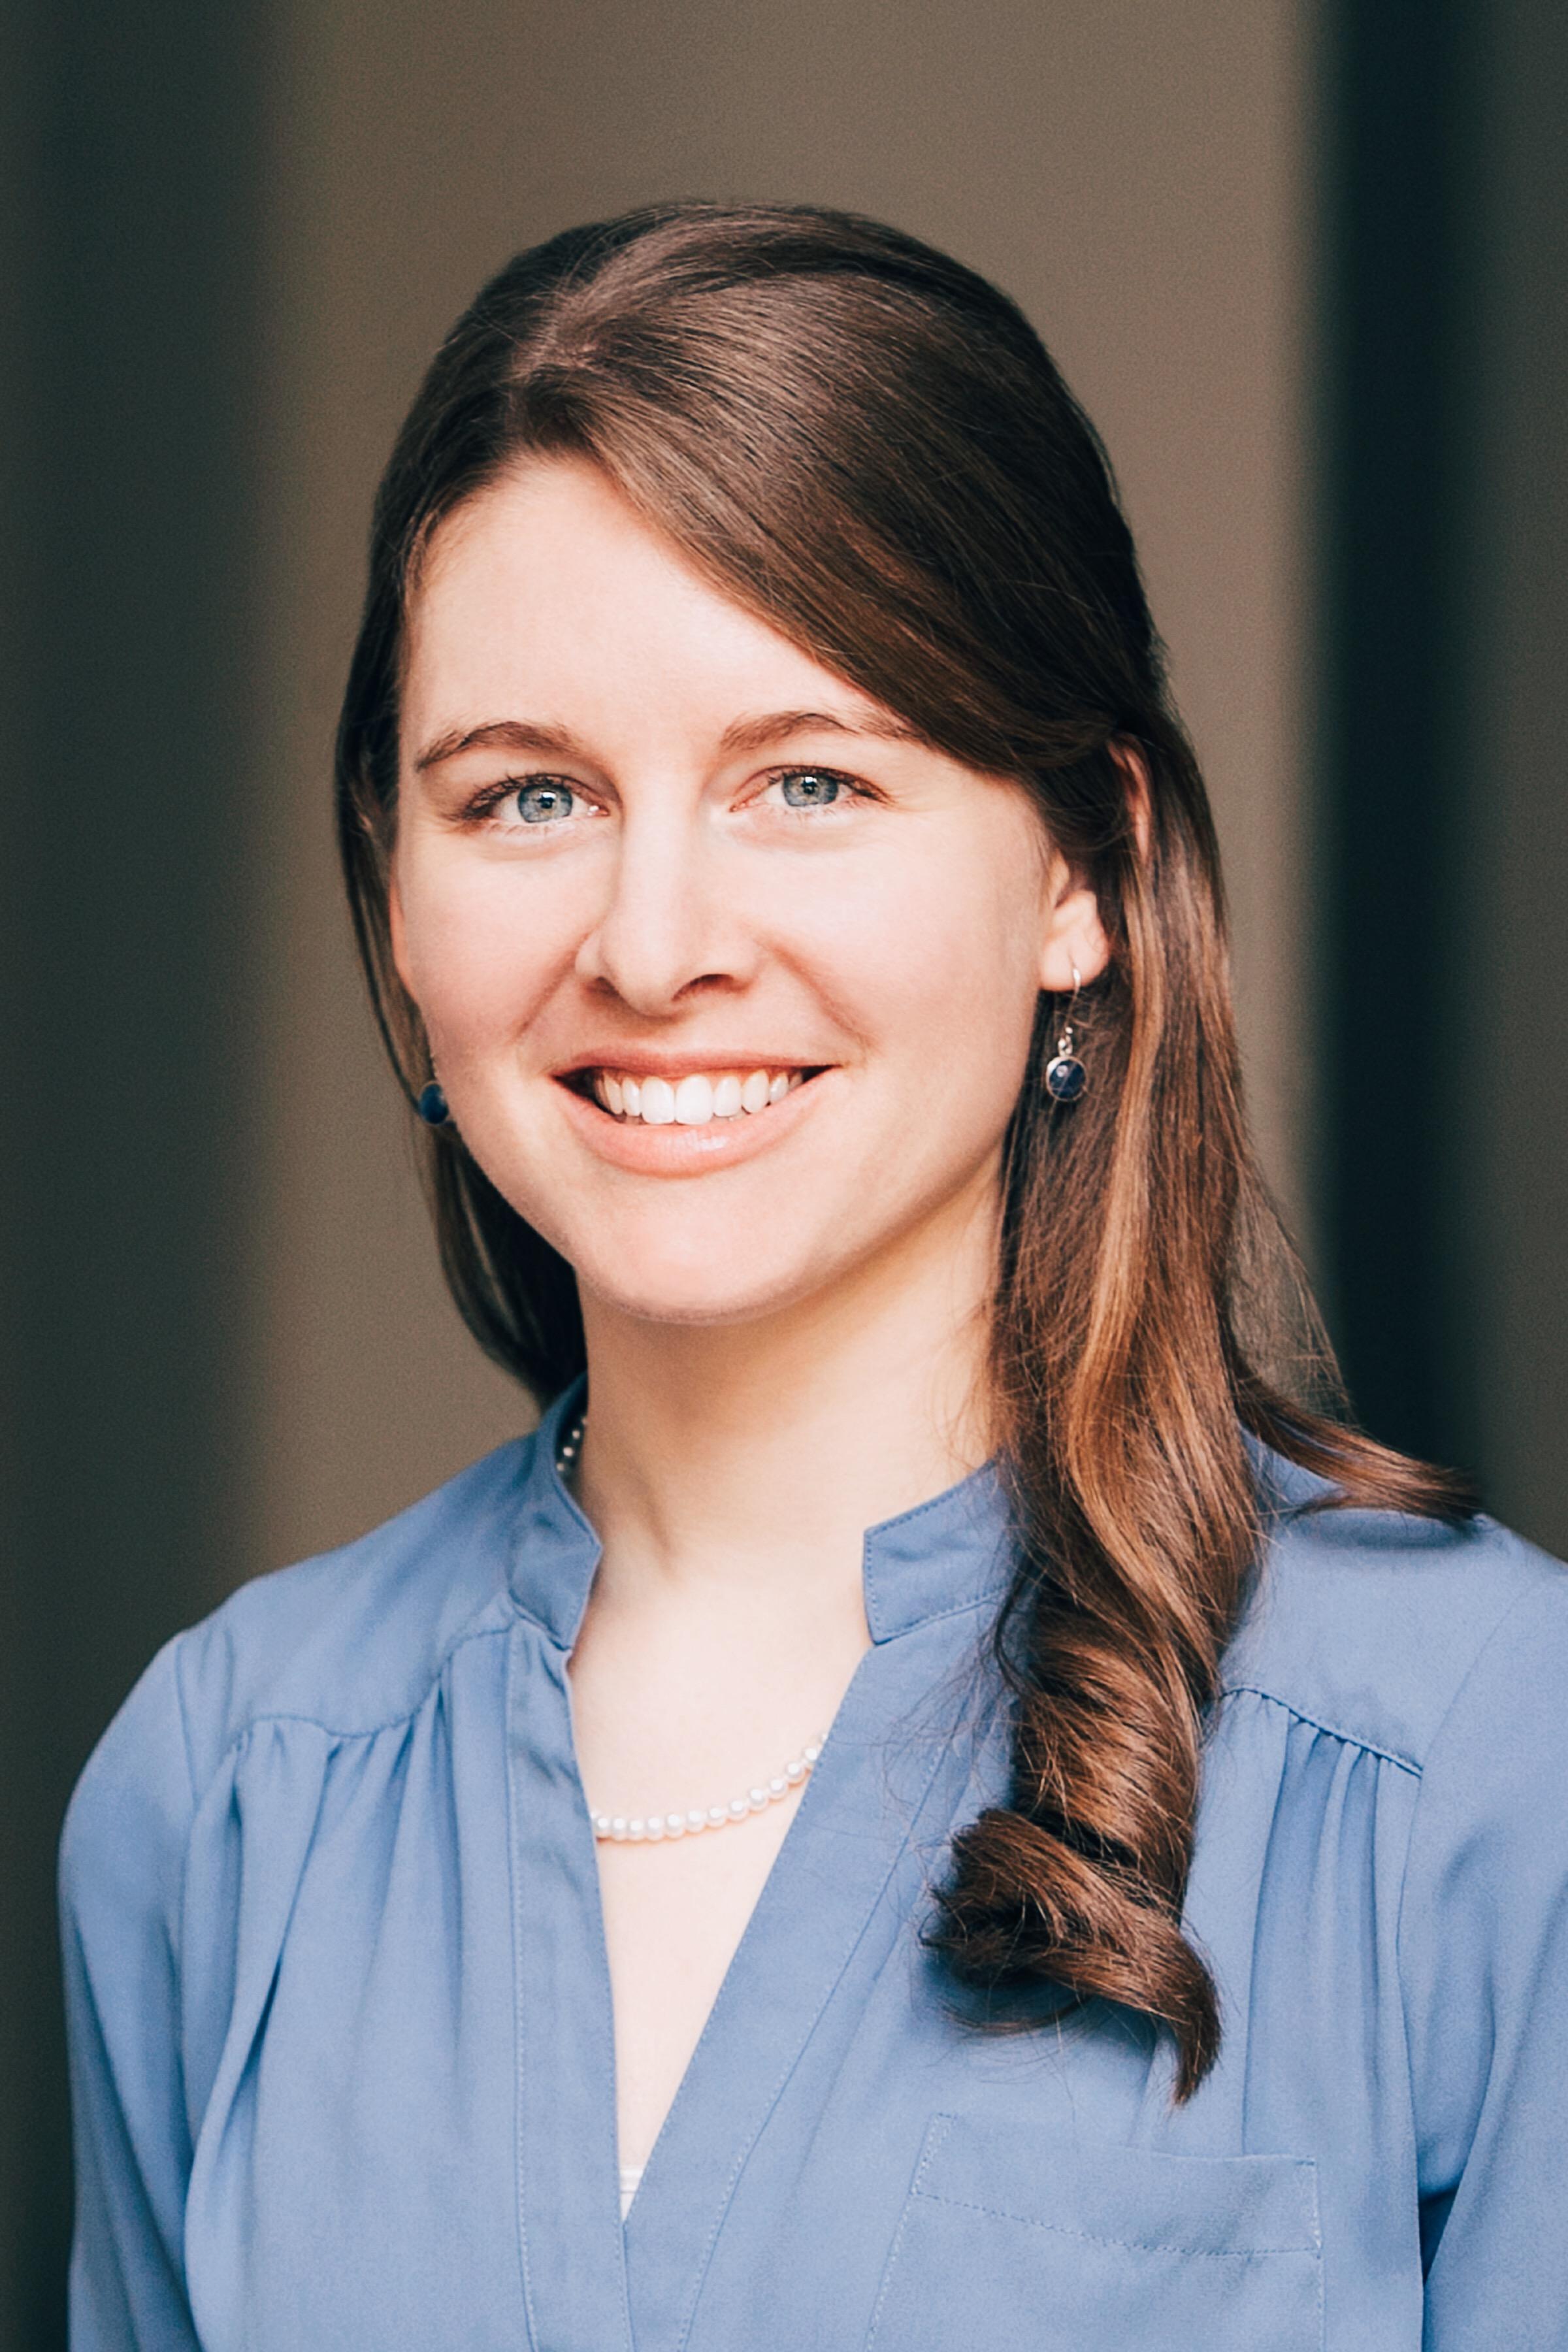 Erin Mackey The Catholic Woman Portrait